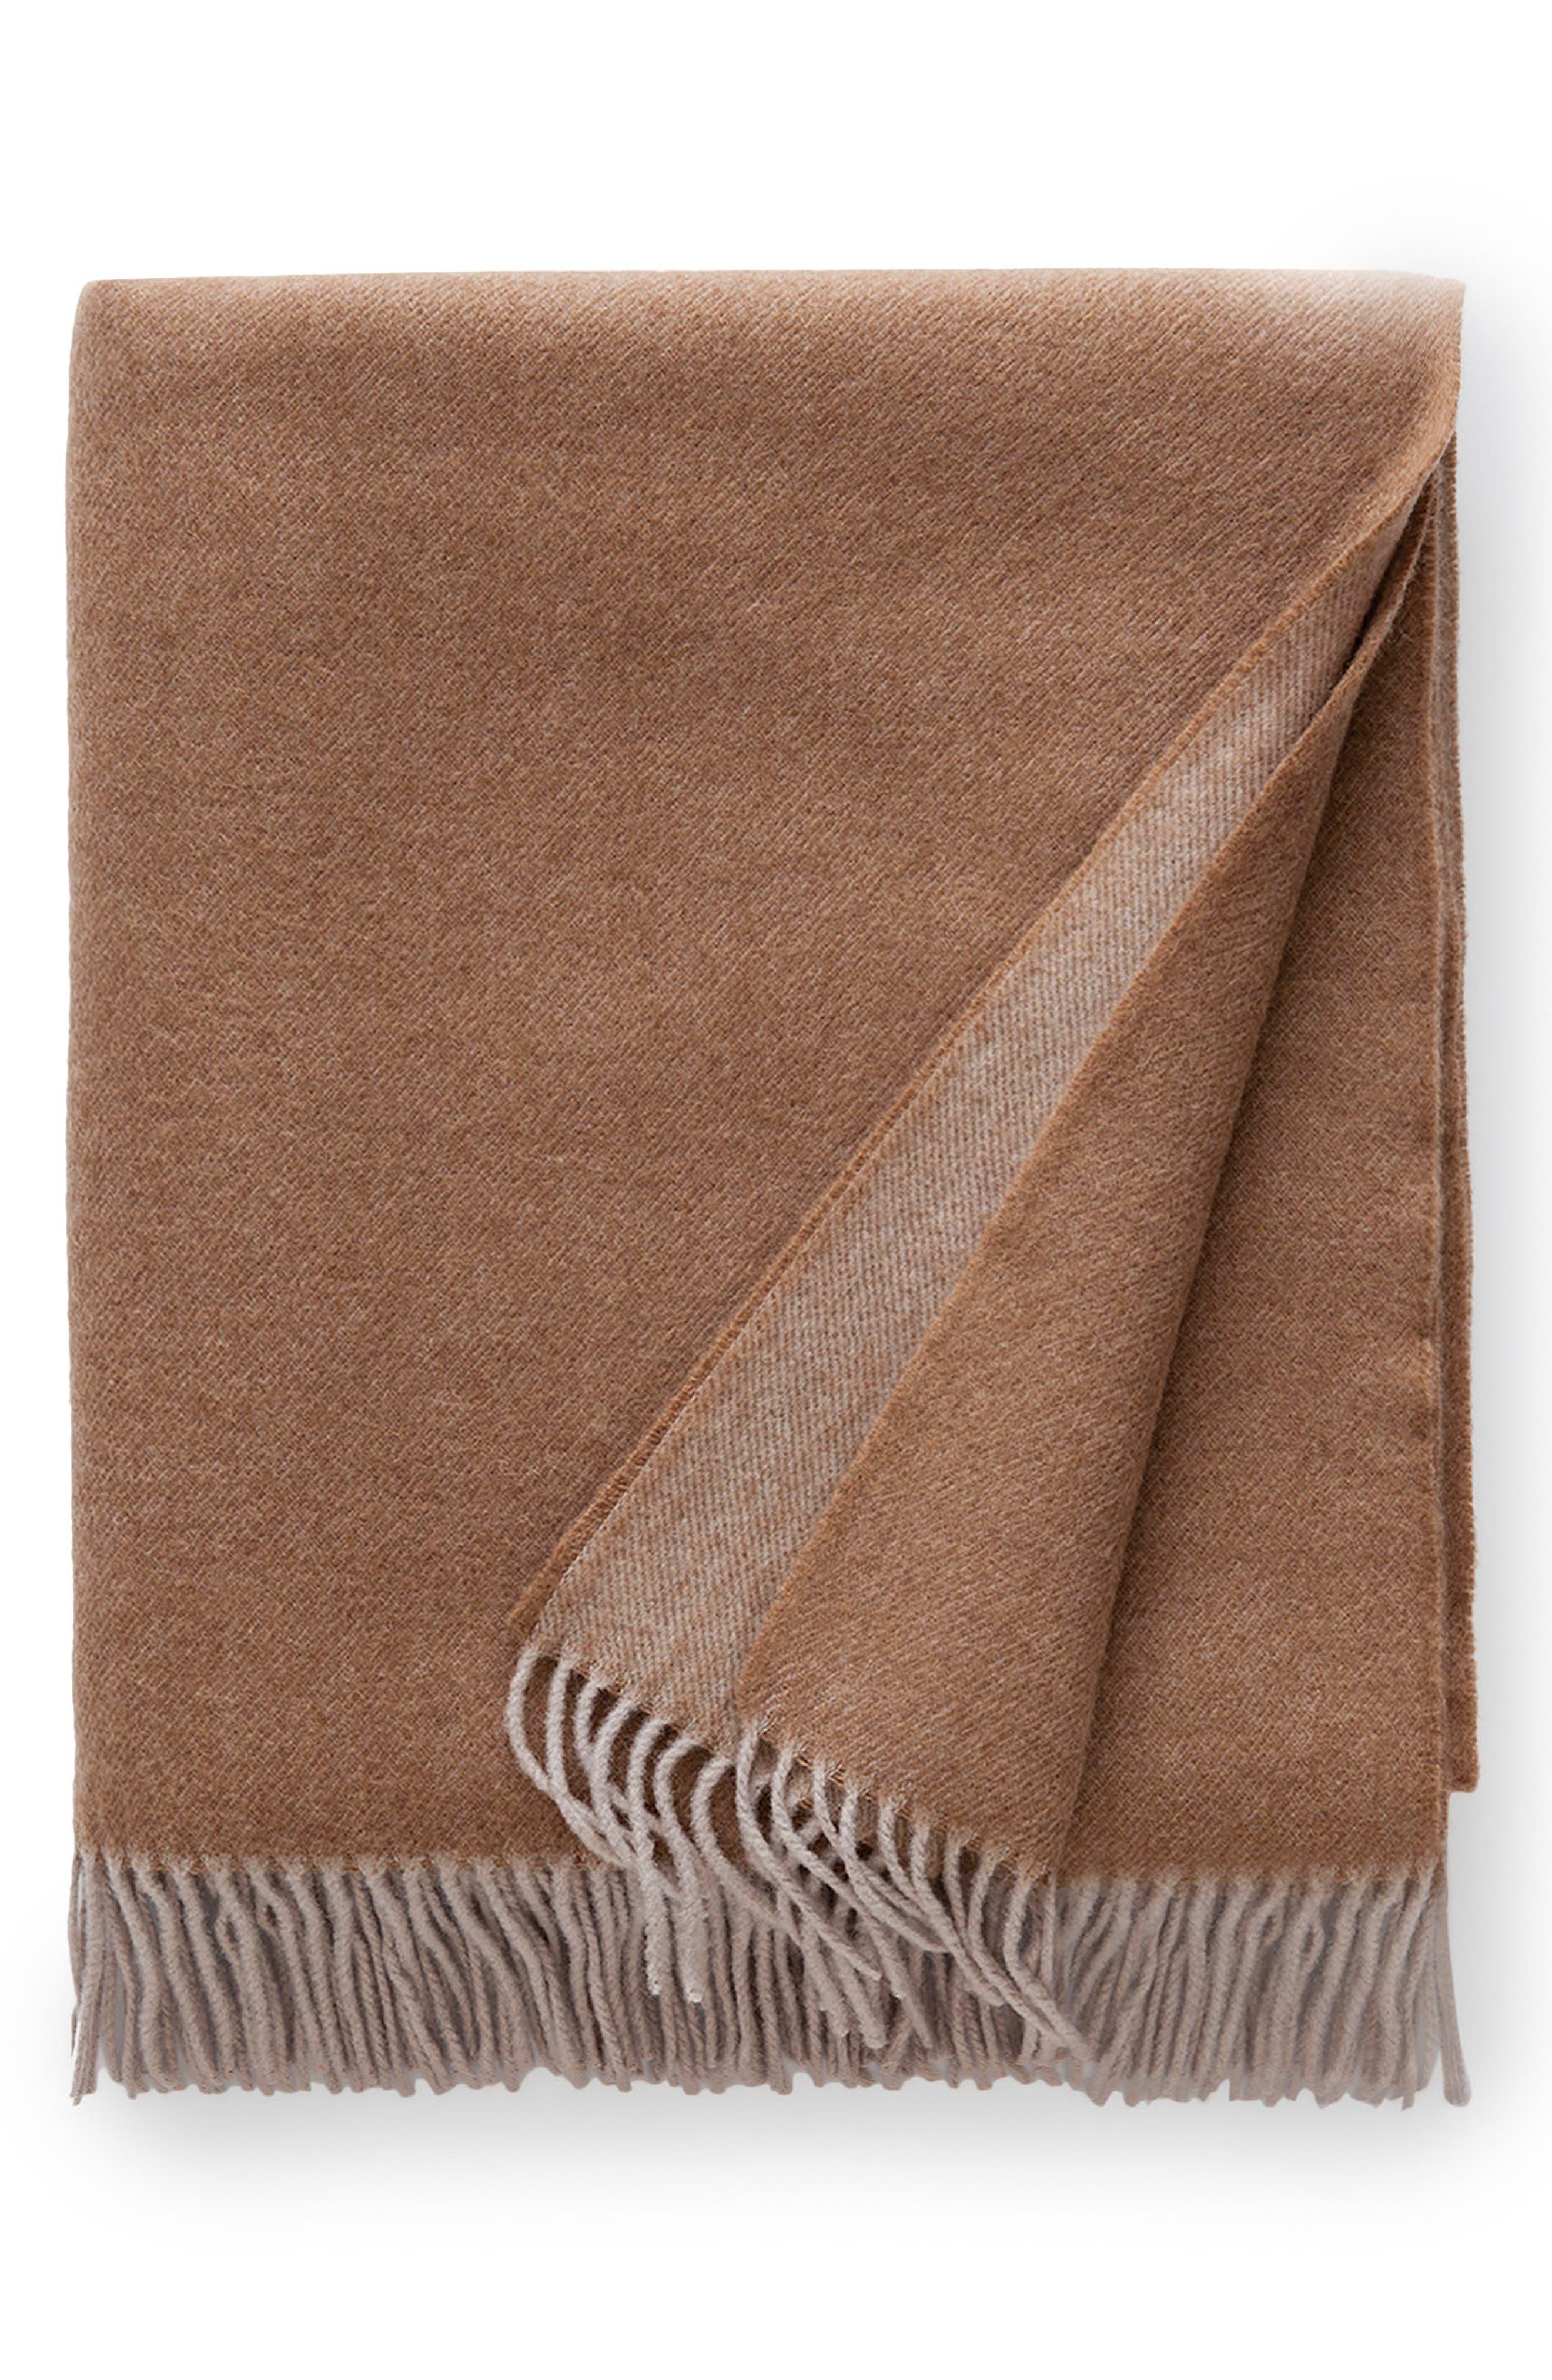 Alternate Image 1 Selected - SFERRA Tartini Merino Wool Throw